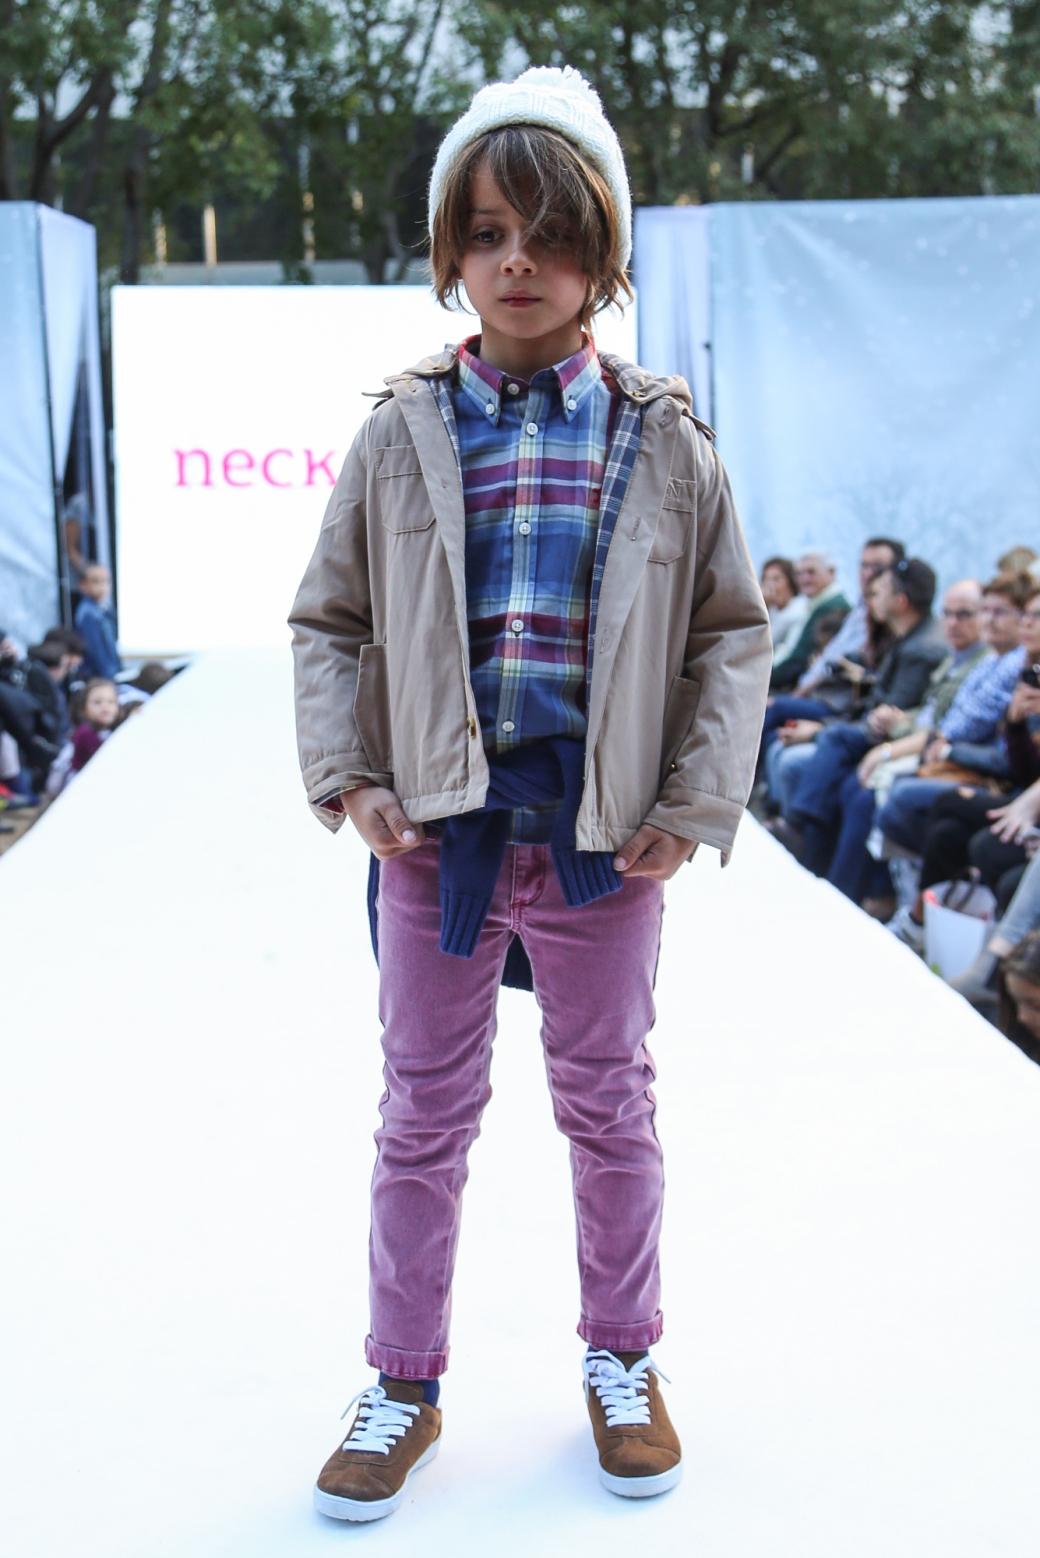 petit-style-walking-bcn-234